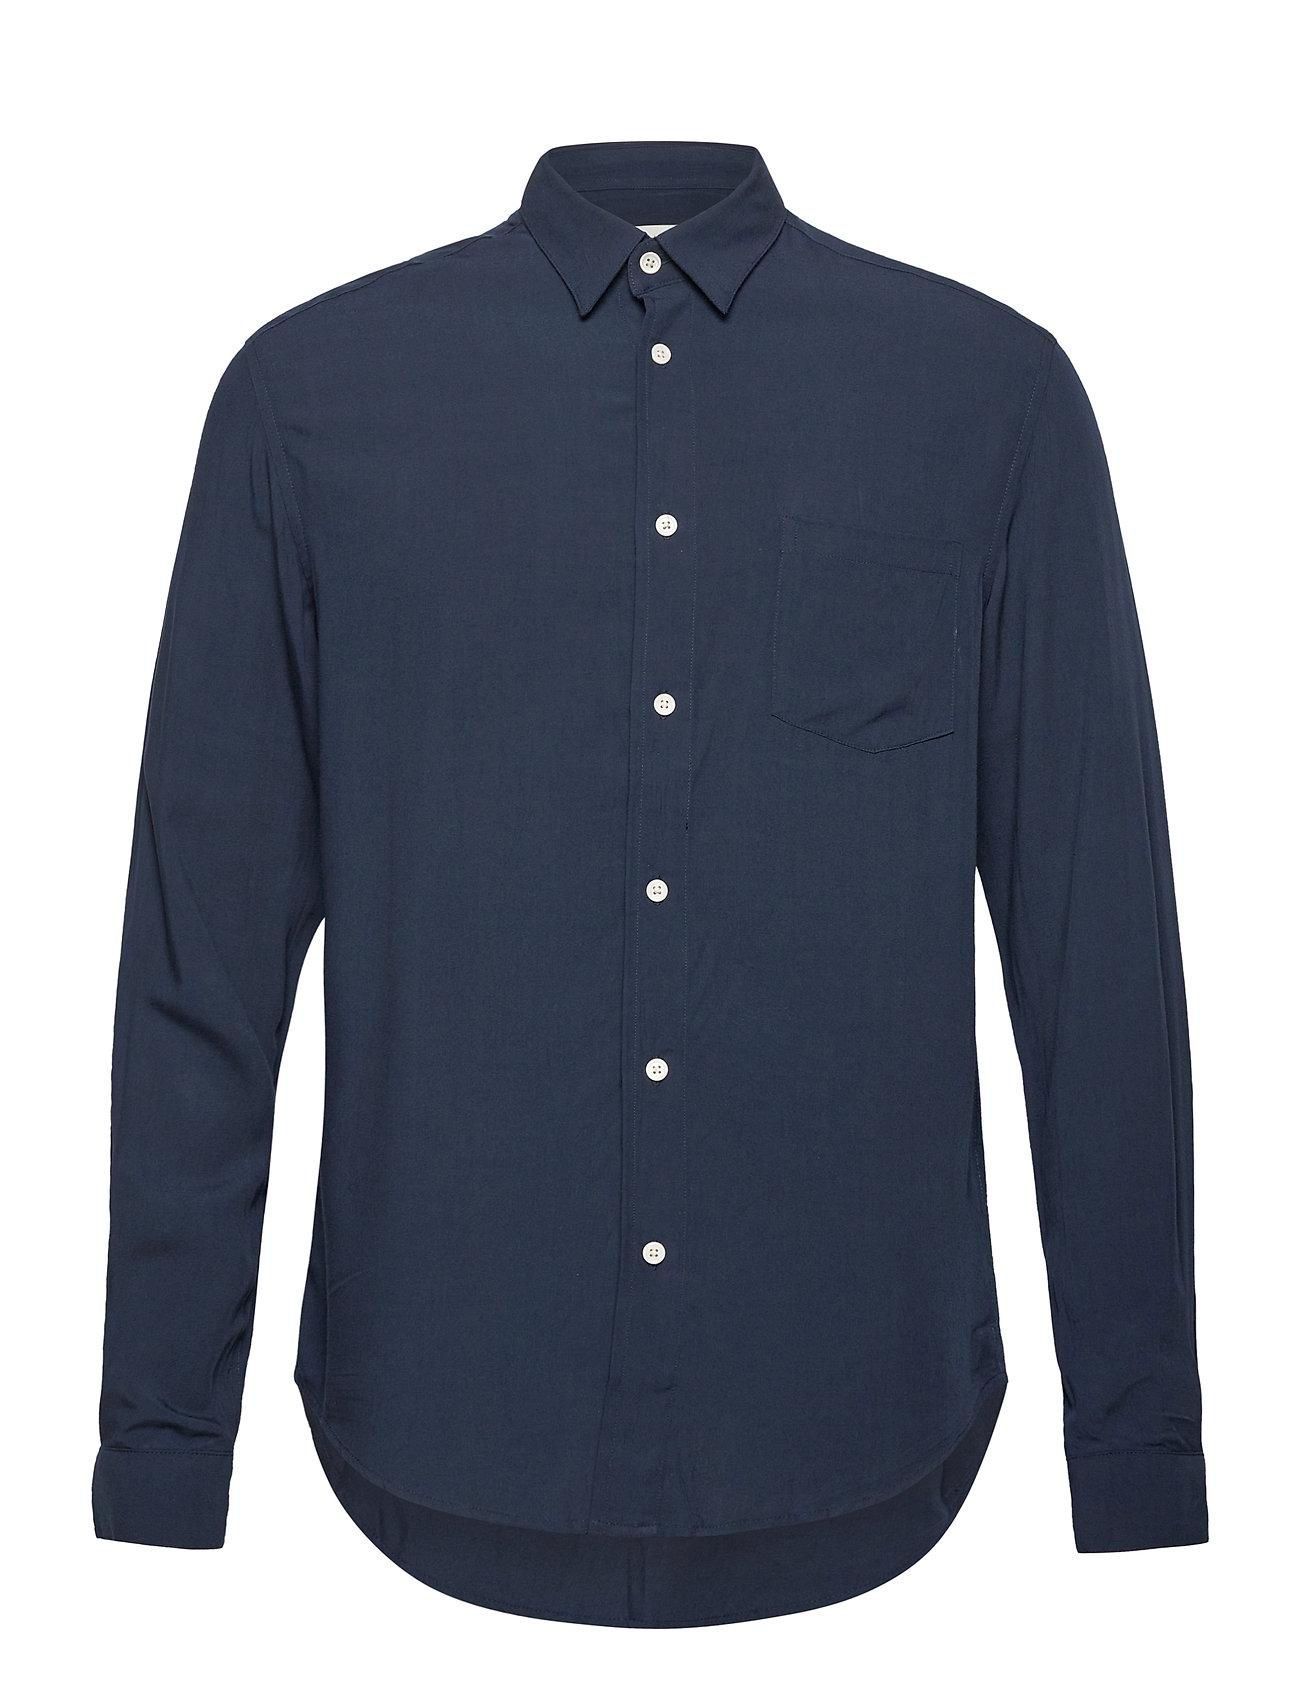 Image of ResteröDs Regular Shirt Skjorte Casual Blå Resteröds (3445311953)